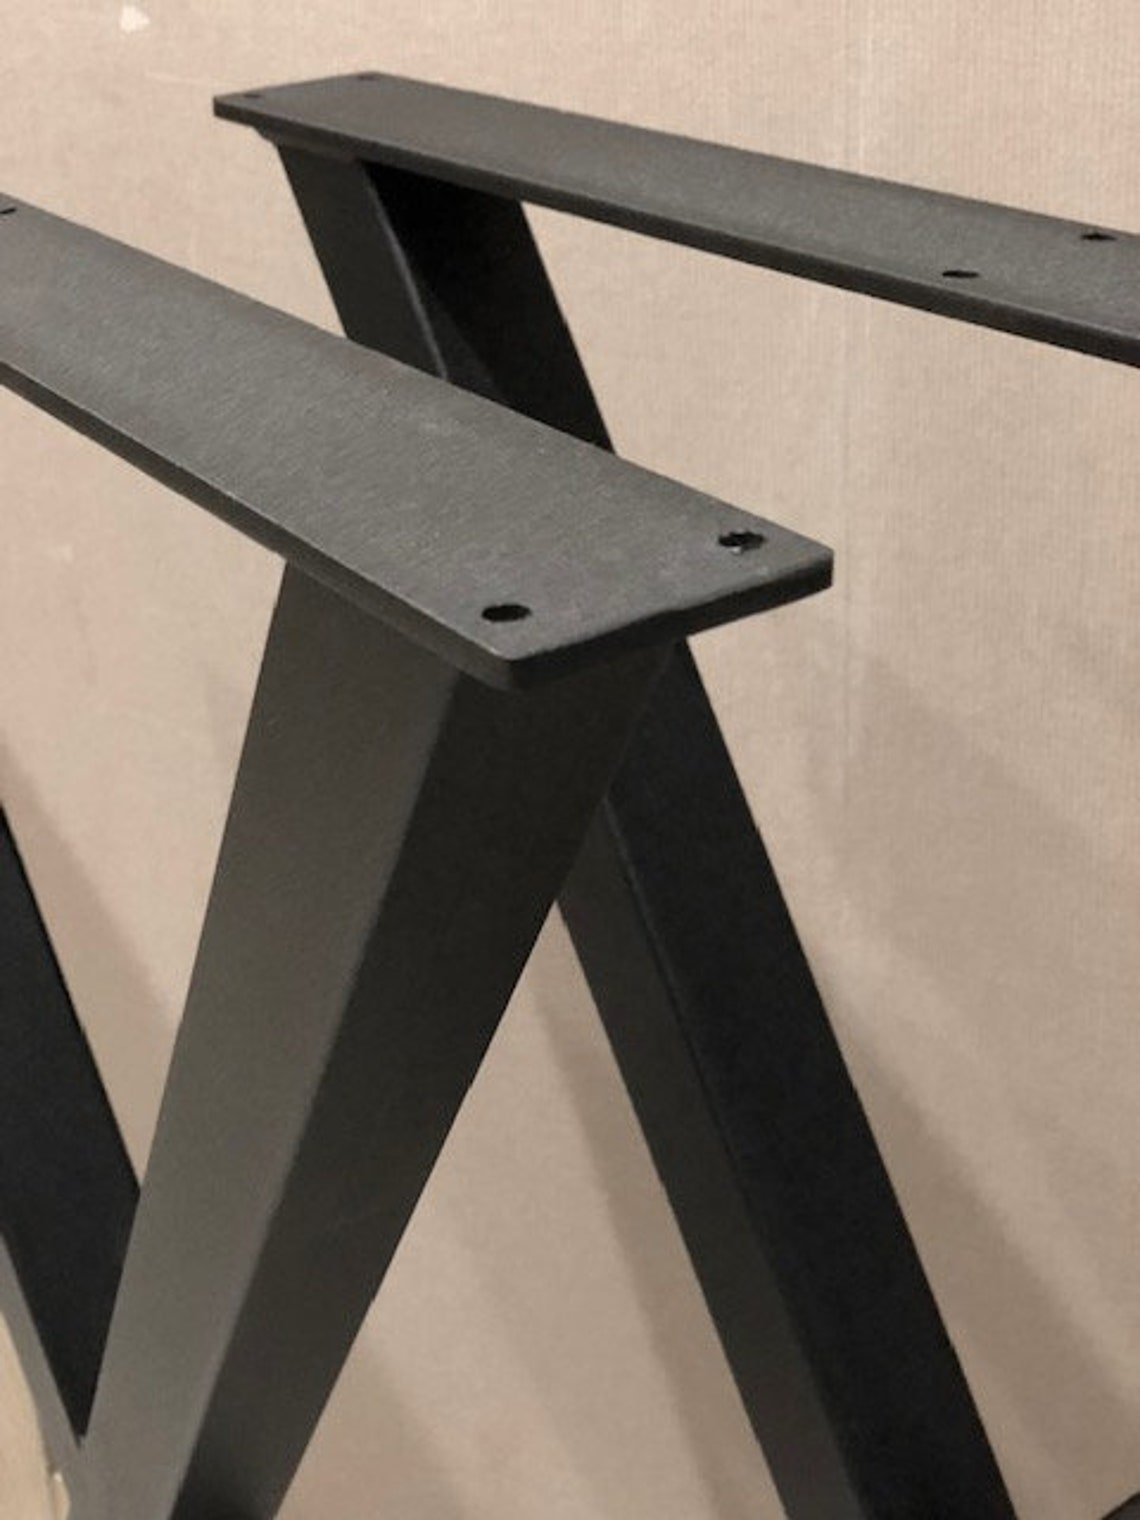 SET of 2 ELEGANT X-type dining table legs, Industrial style table legs, Steel metal table legs, Dining table legs, Kitchen table legs, Loft